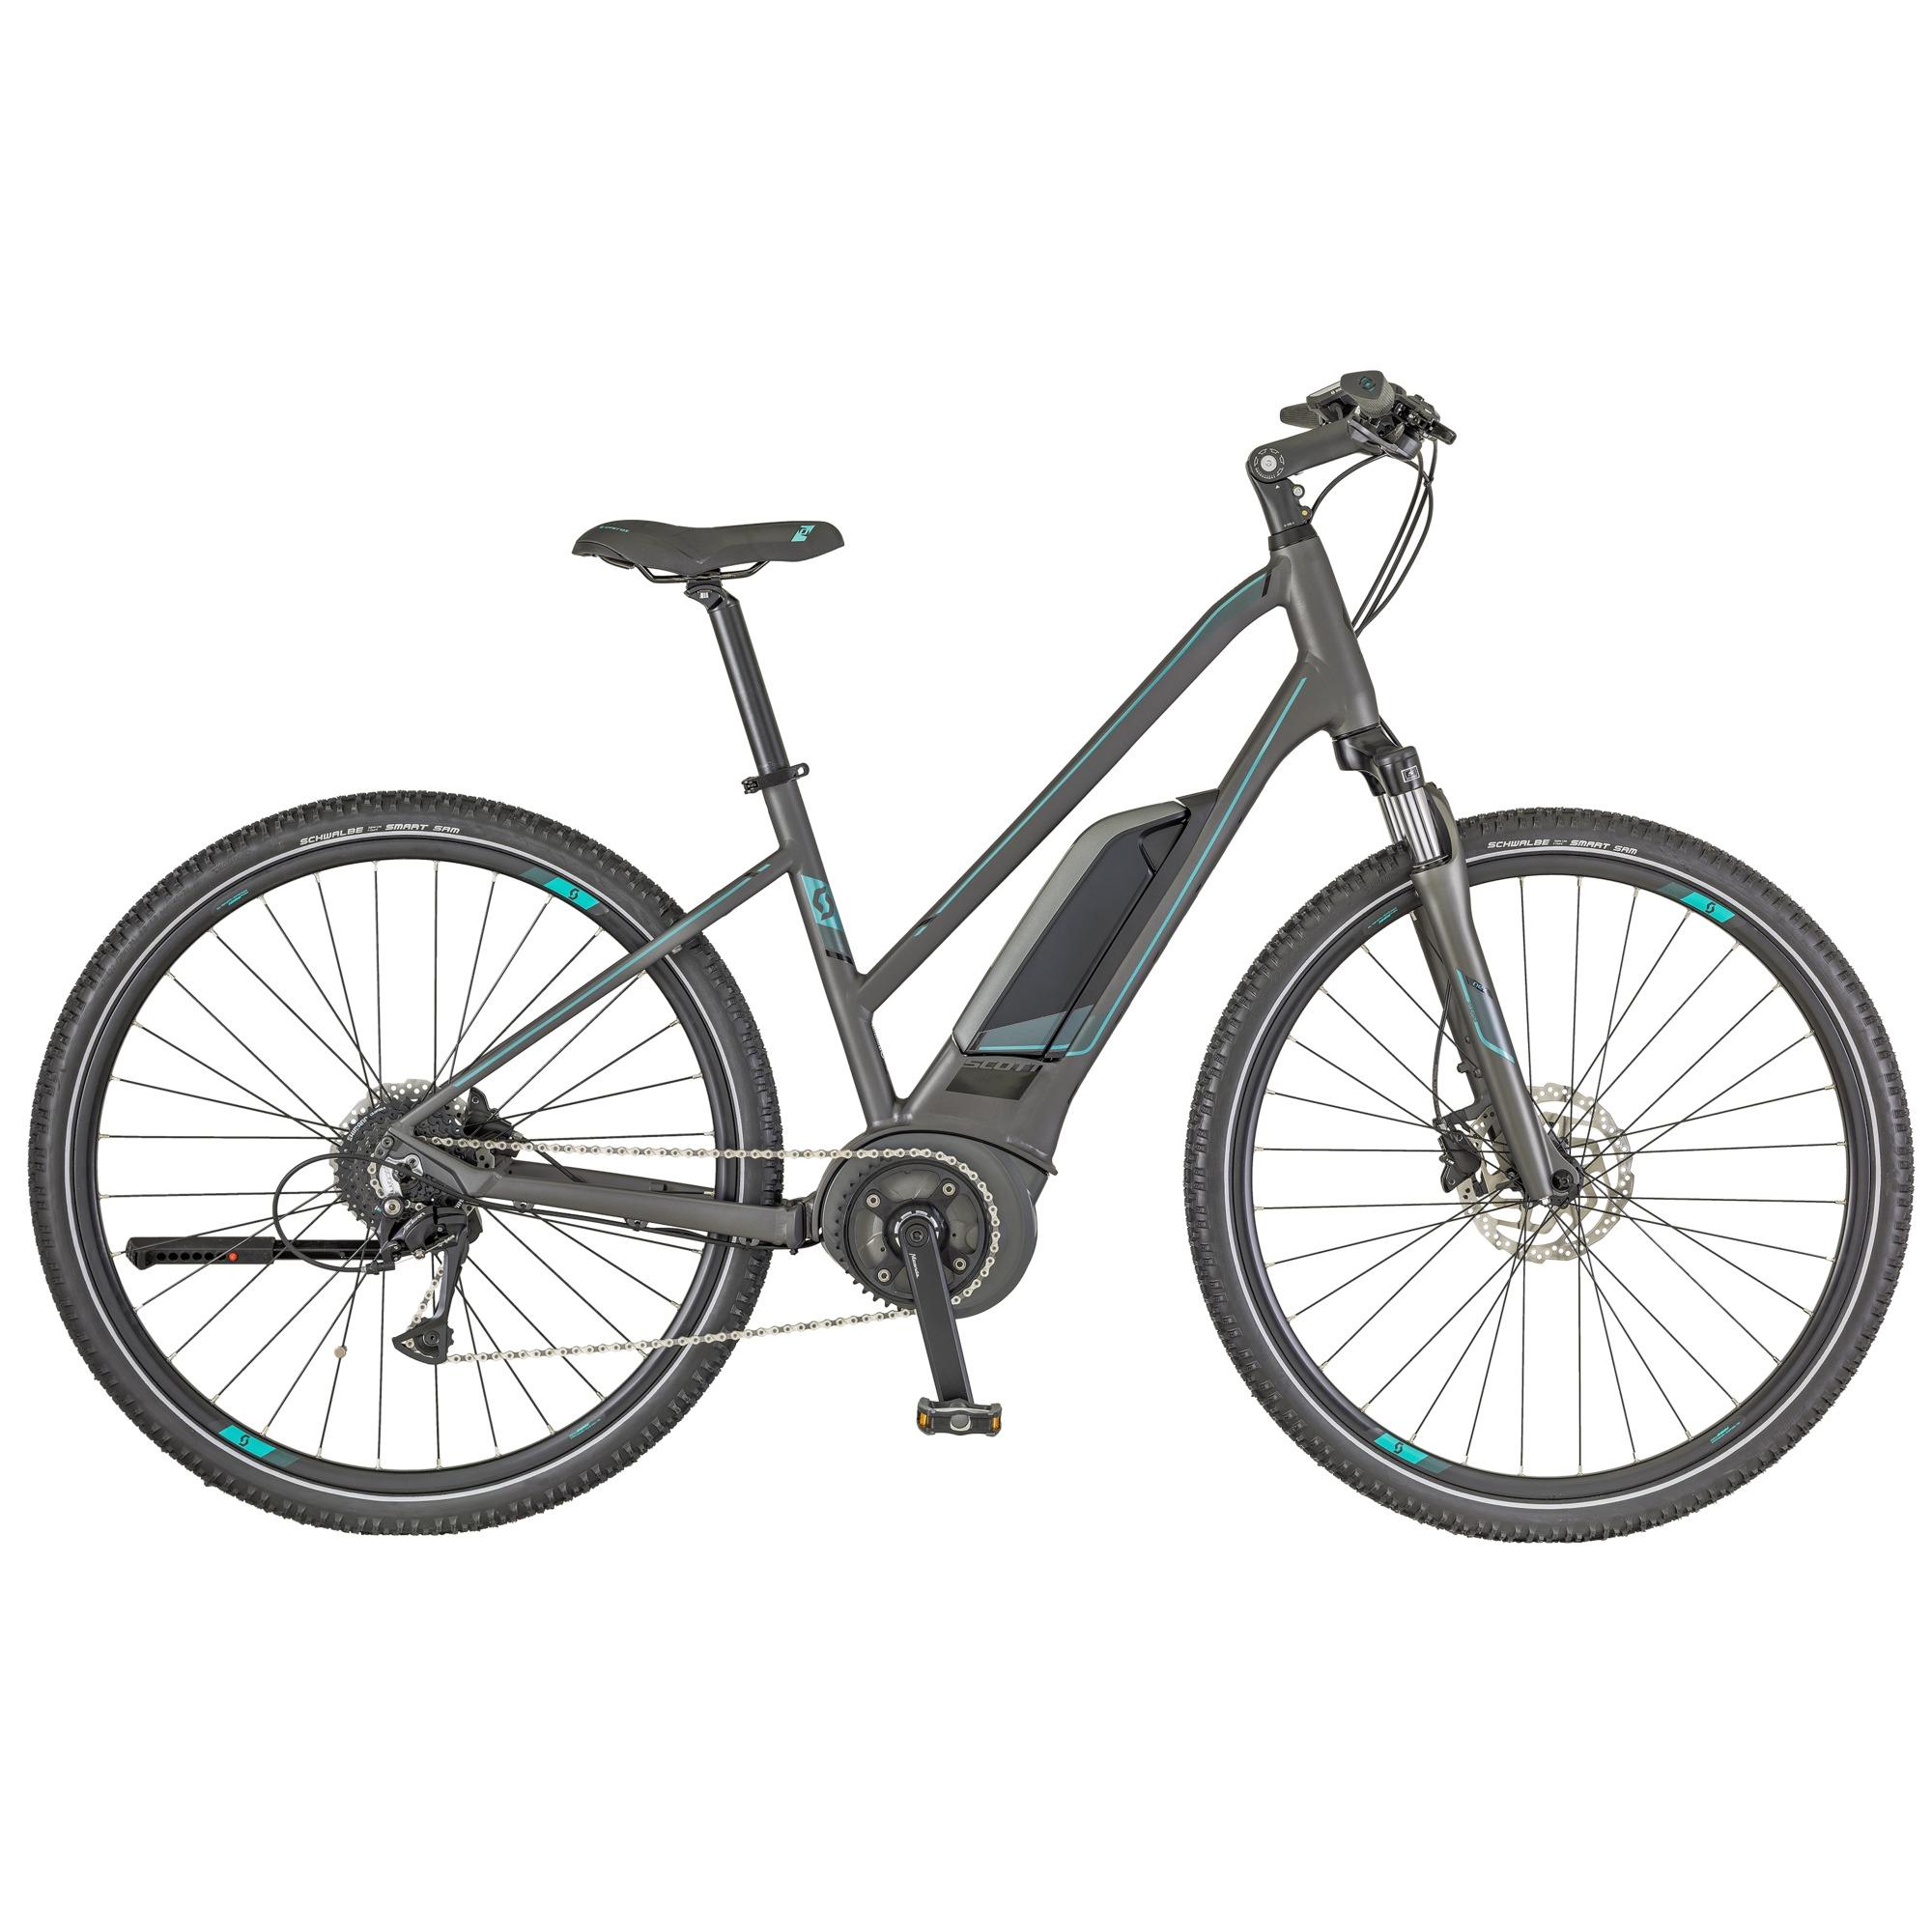 SCOTT E-Sub Cross 20 Damenfahrrad S - Fahrrad online kaufen | Online Shop Bike Profis